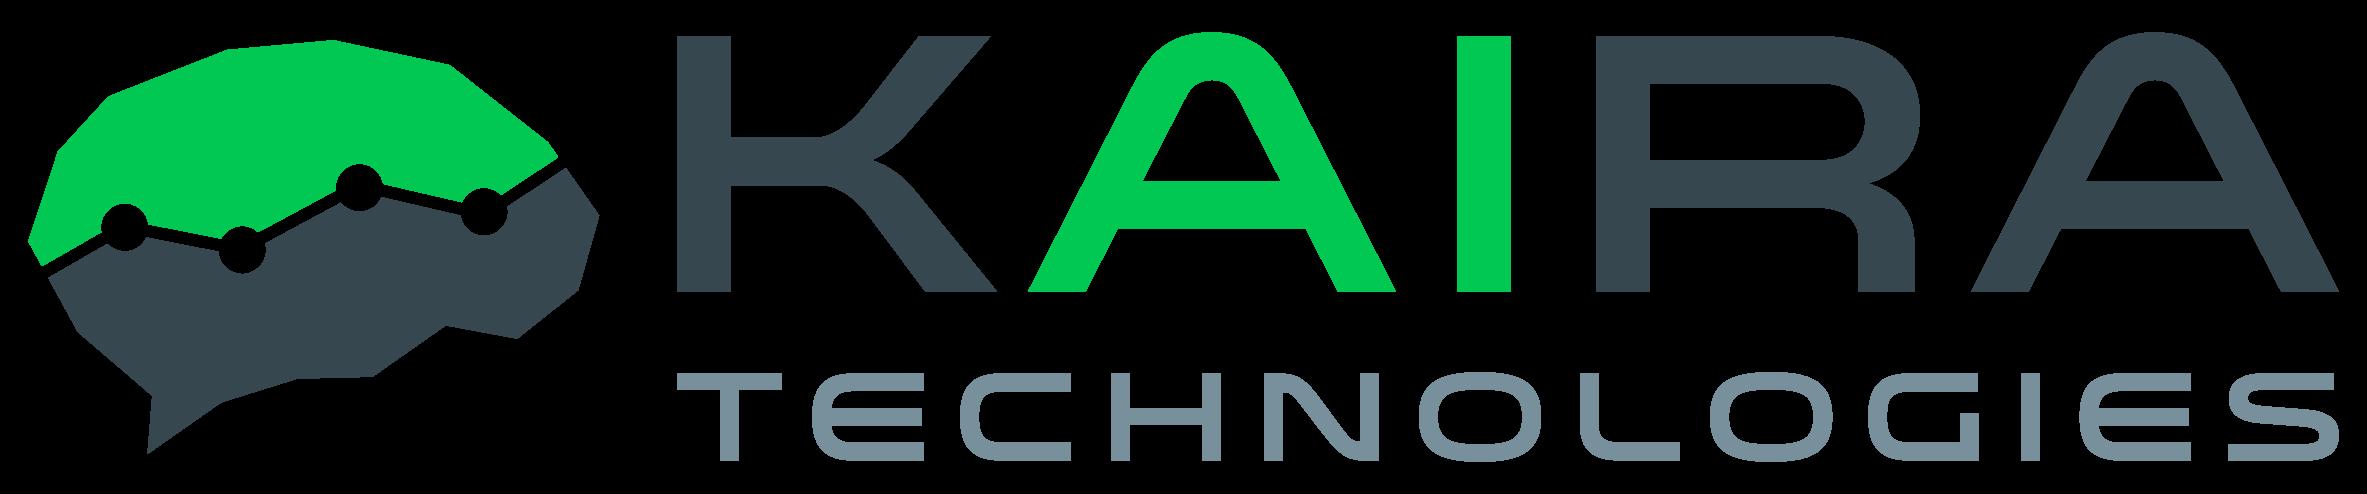 kairatechnologies